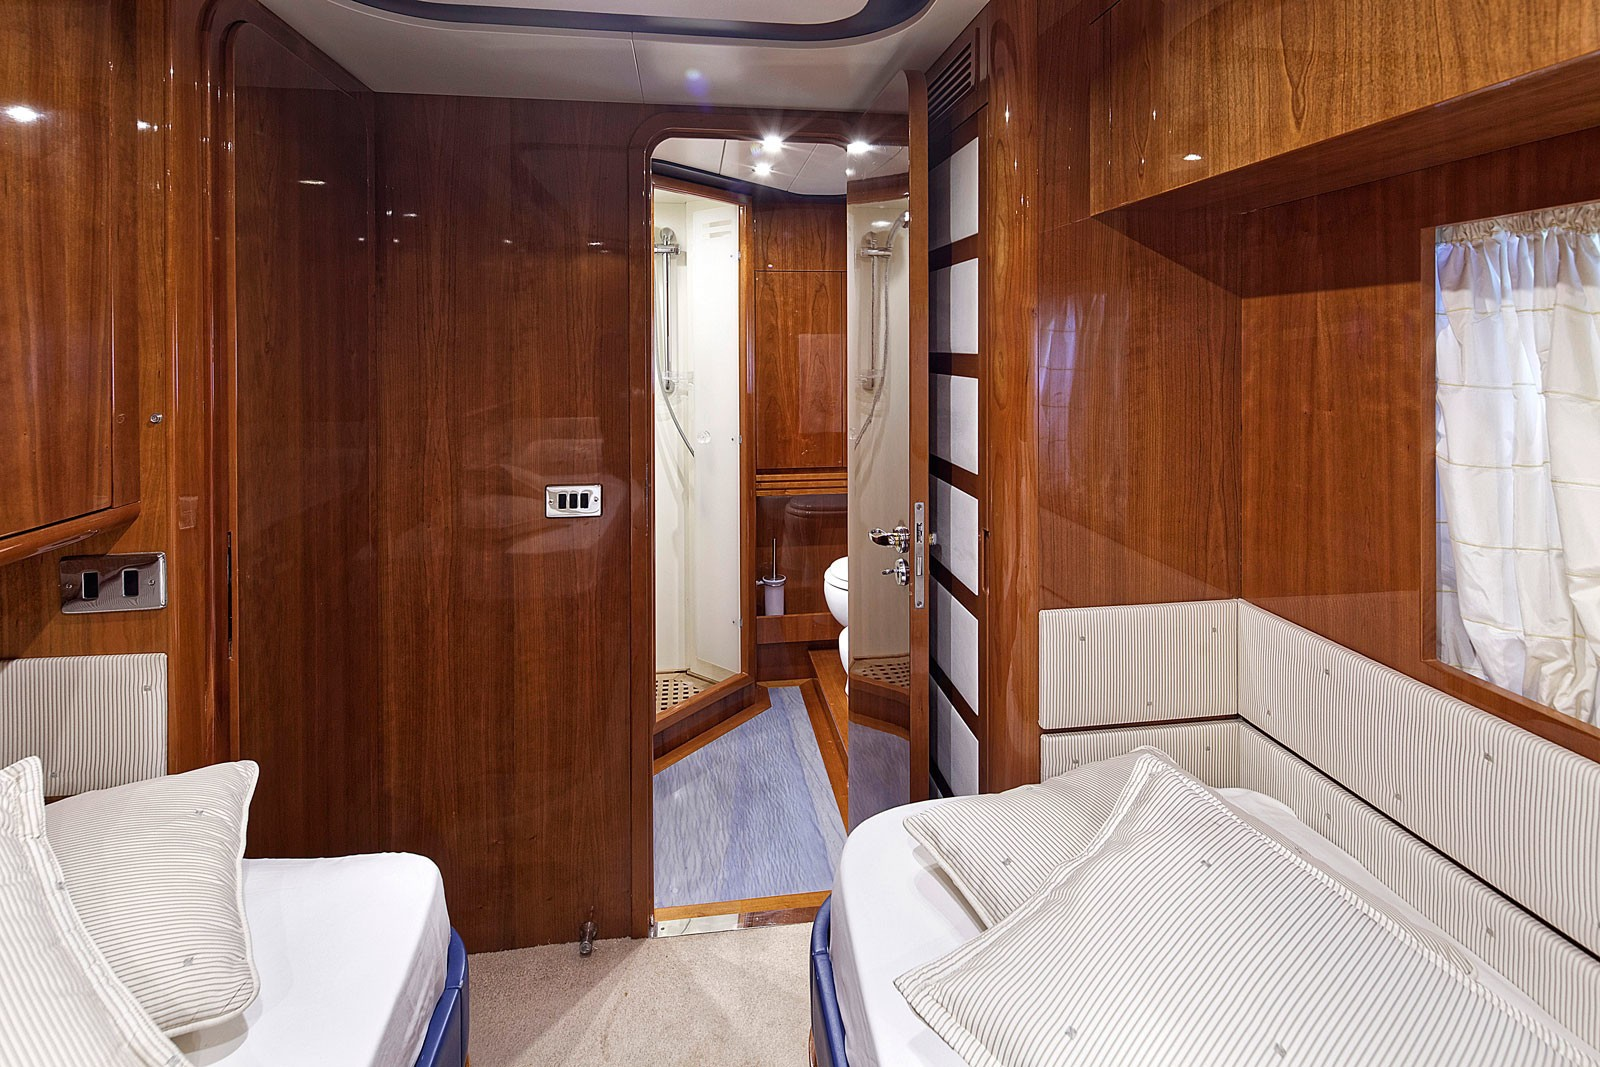 The 21m Yacht AQVA